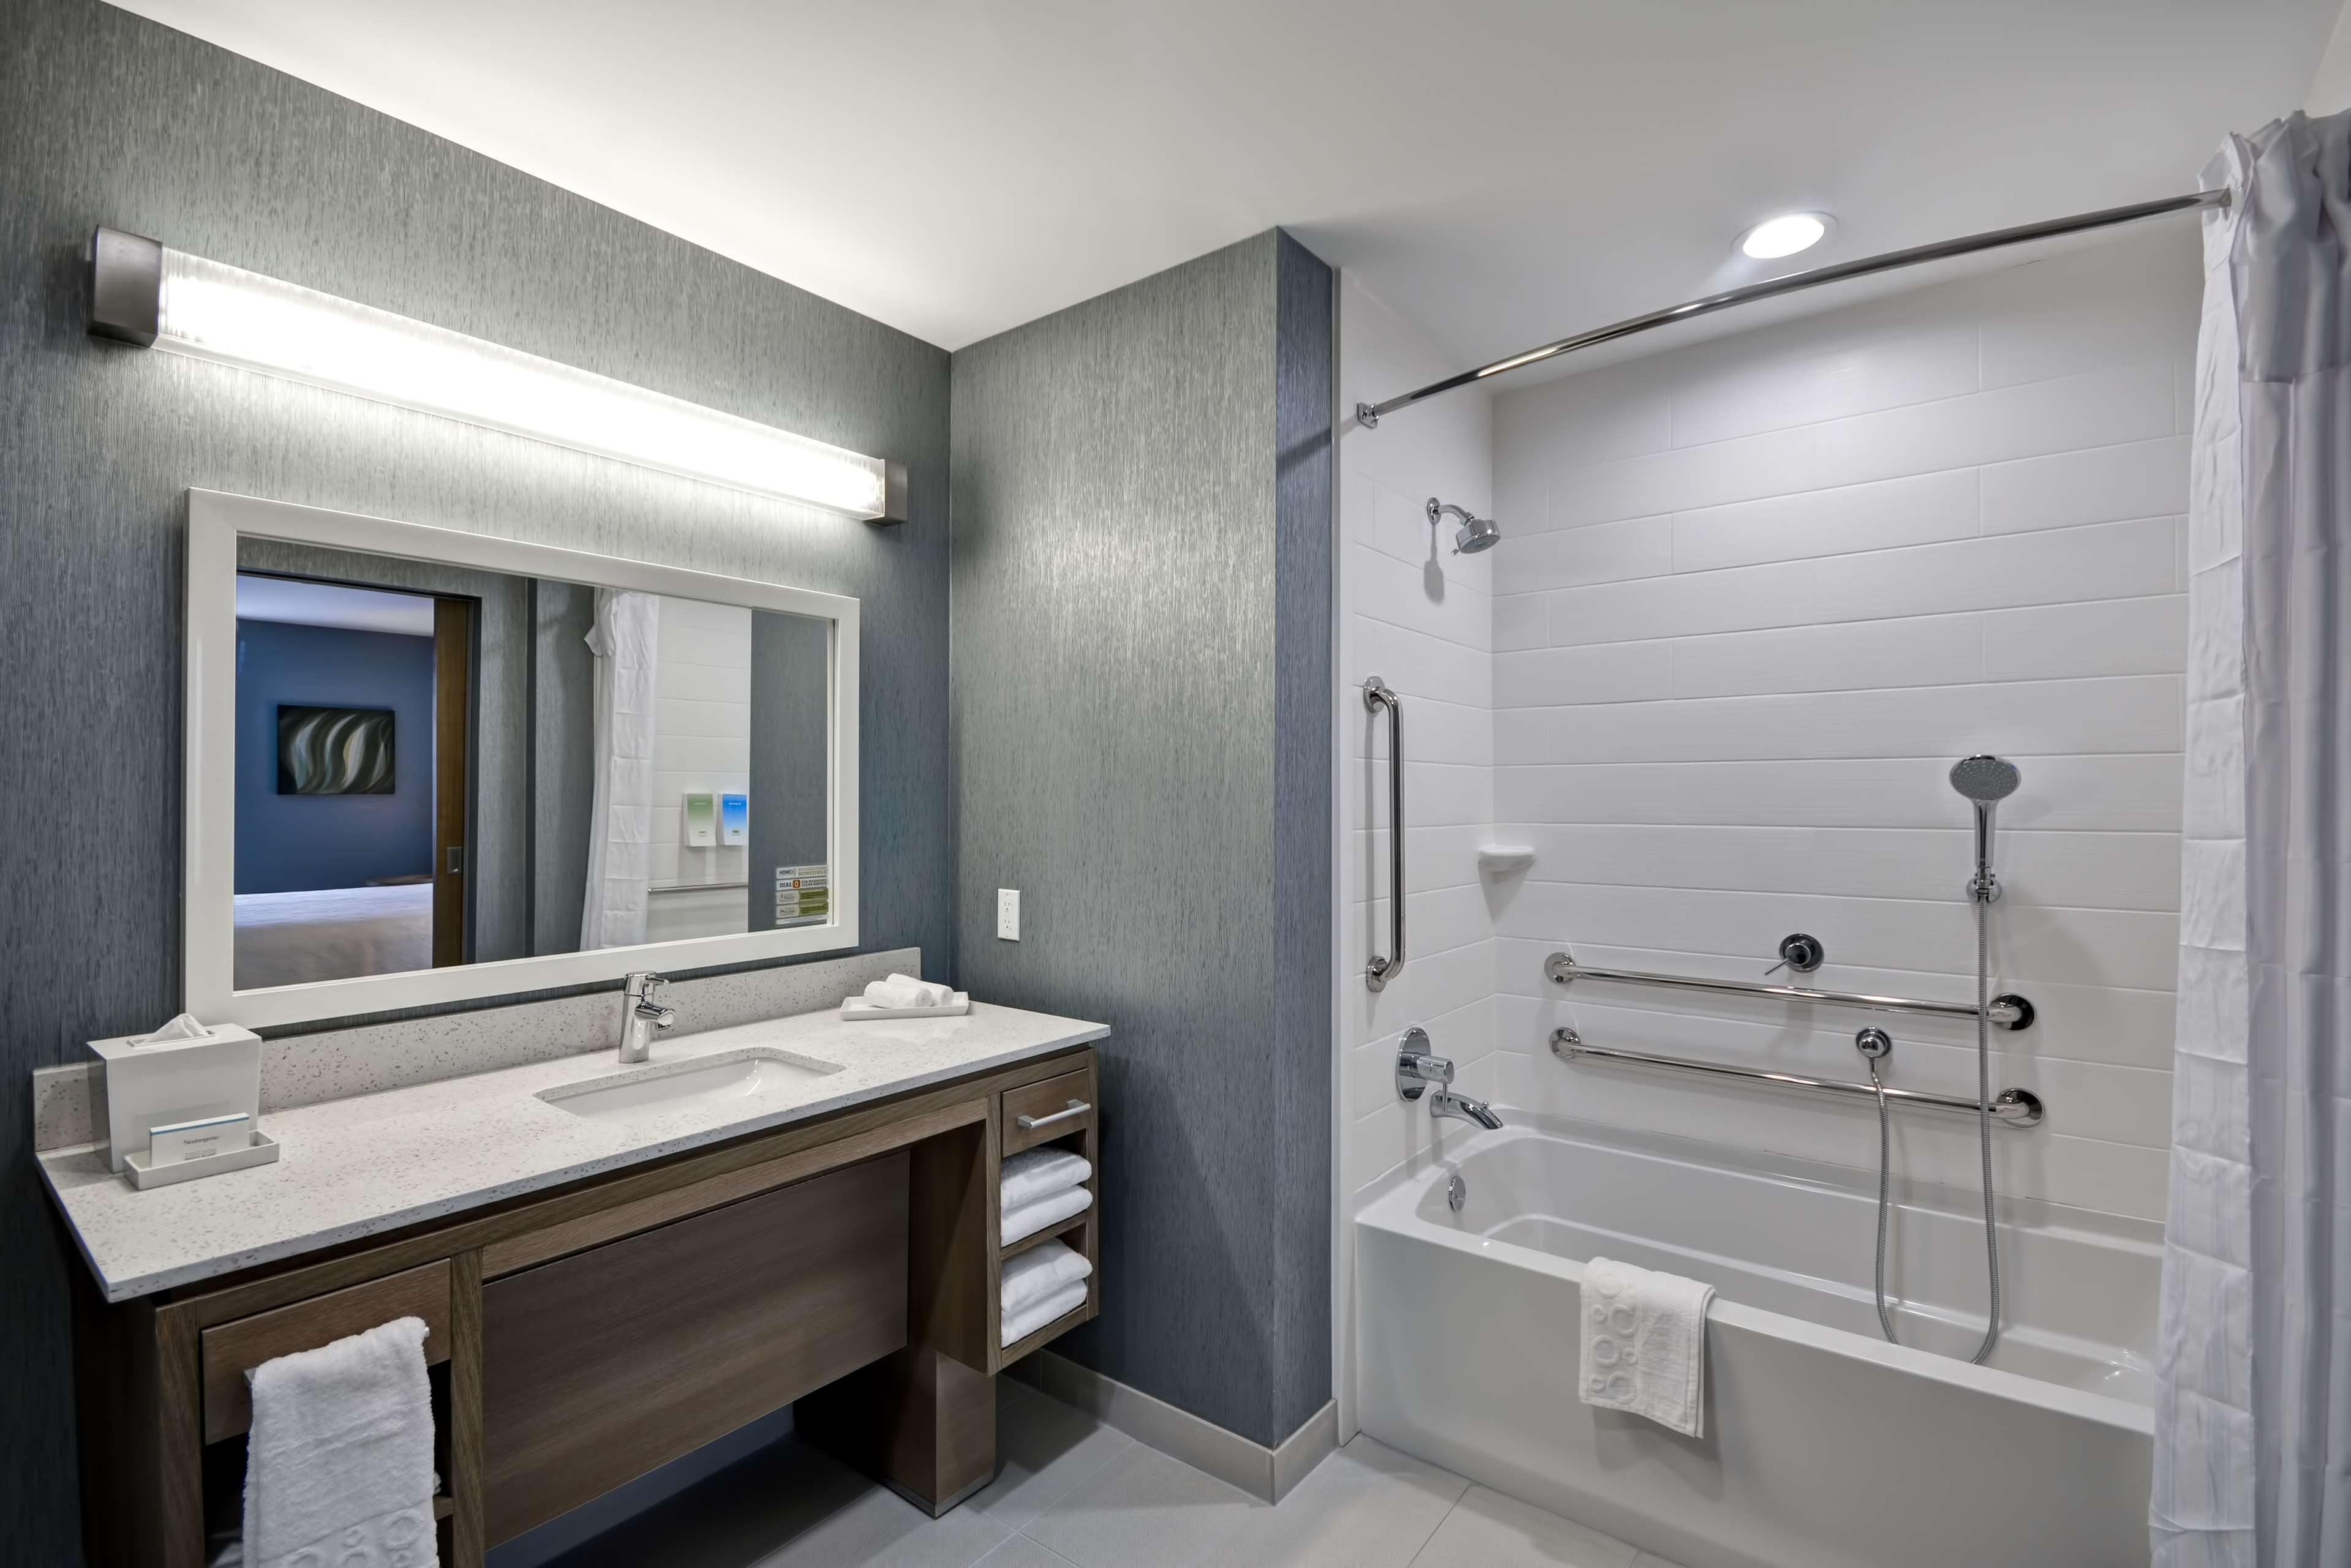 Home2 Suites by Hilton Jackson image 18